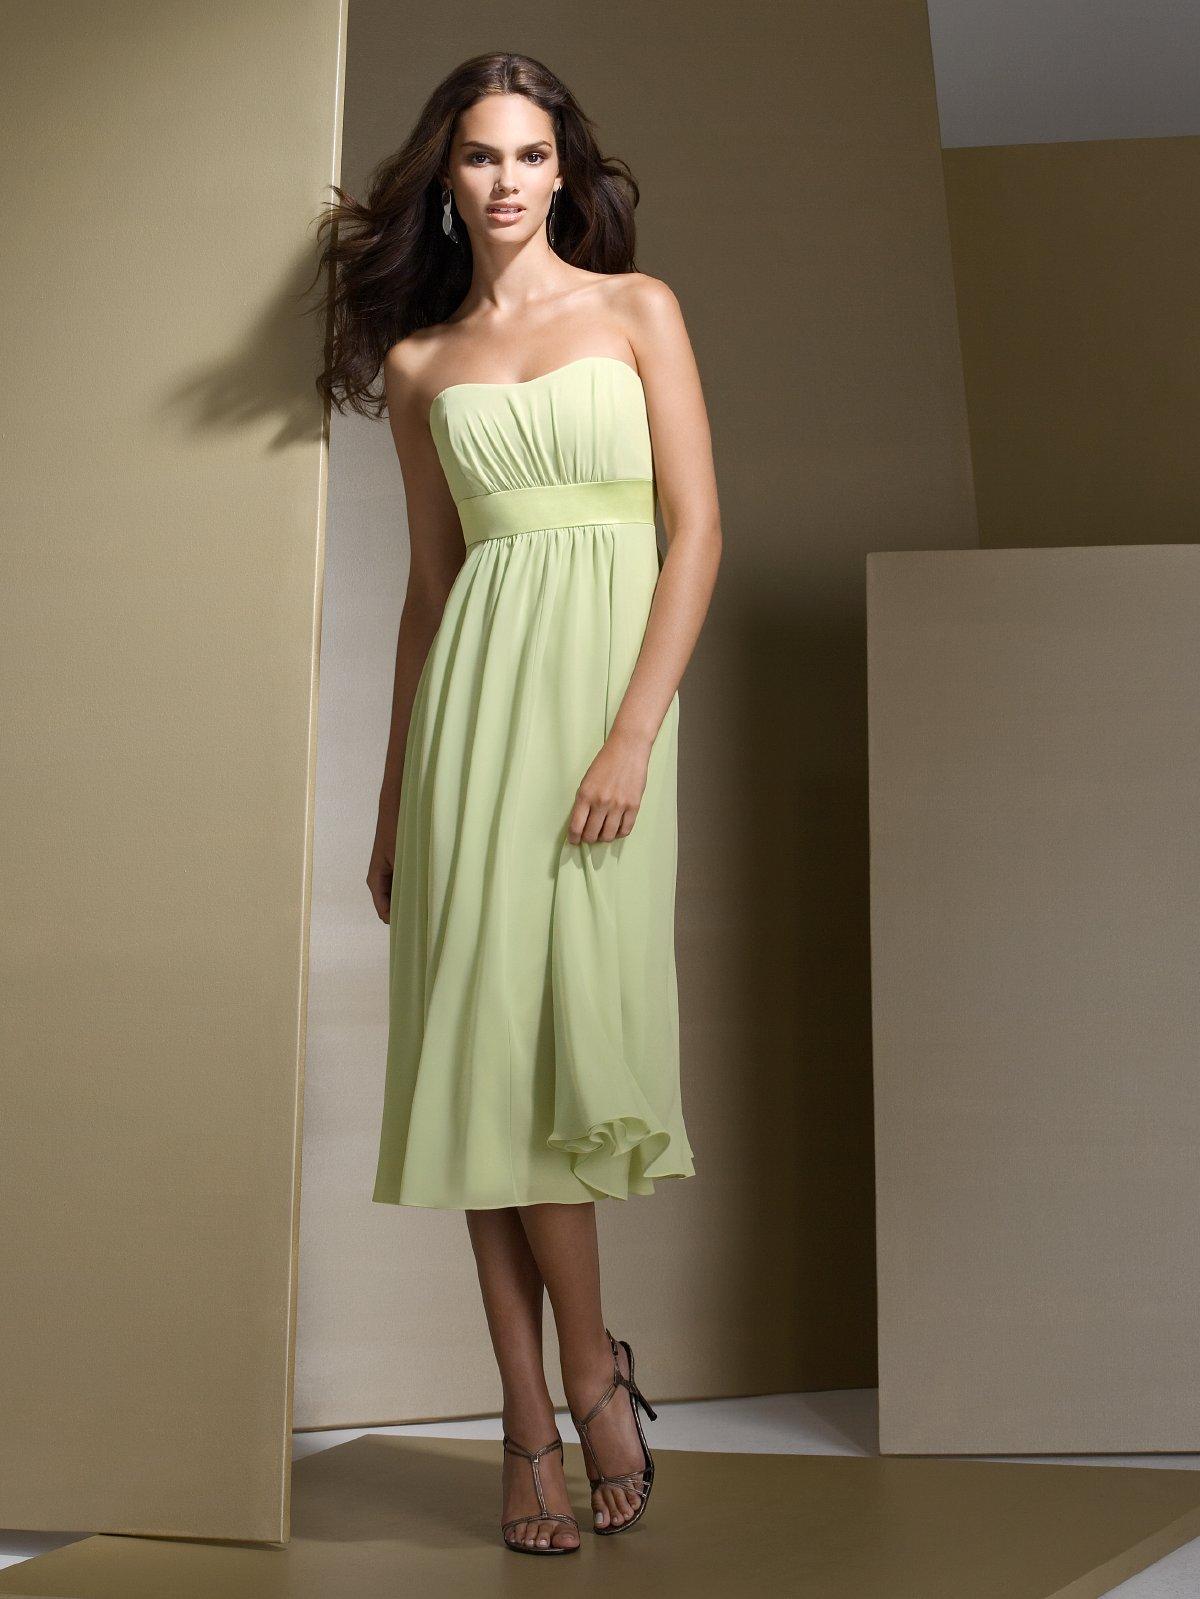 cd6c5bbef6 Sage Empire Strapless Sweetheart Zipper Pleated Tea Length Chiffon Prom  Dresses